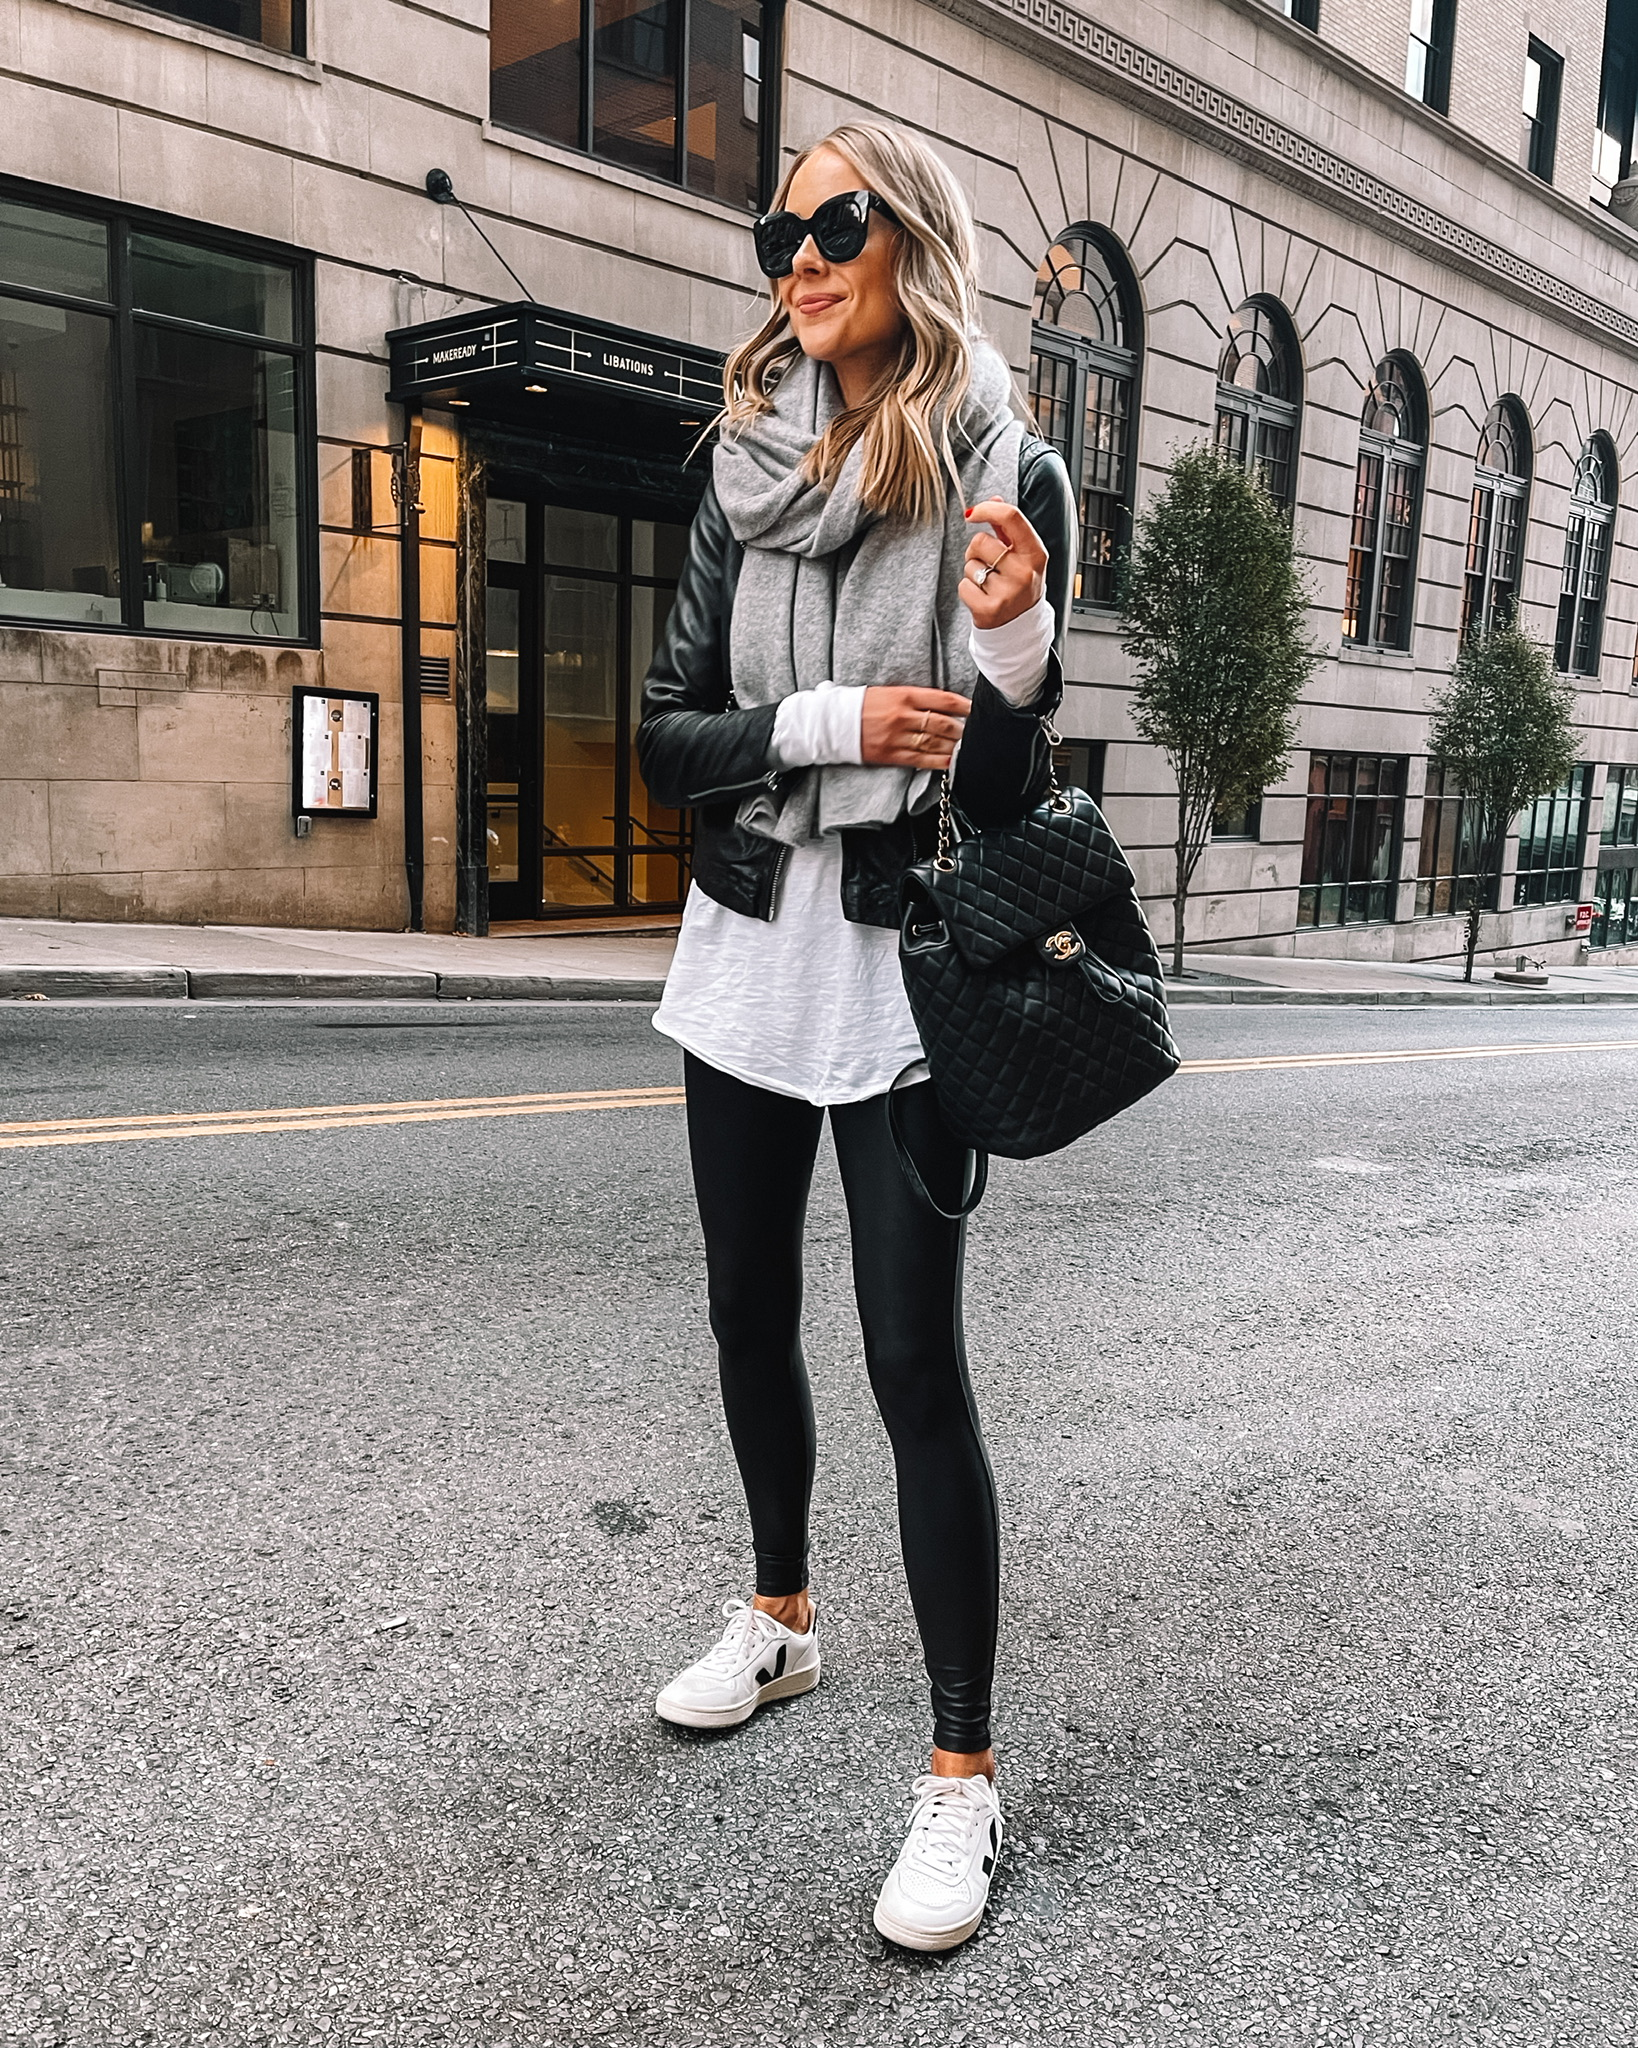 Fashion Jackson Wearing Black Leather Jacket Spanx Faux Leather Leggings Grey Scarf Street Style